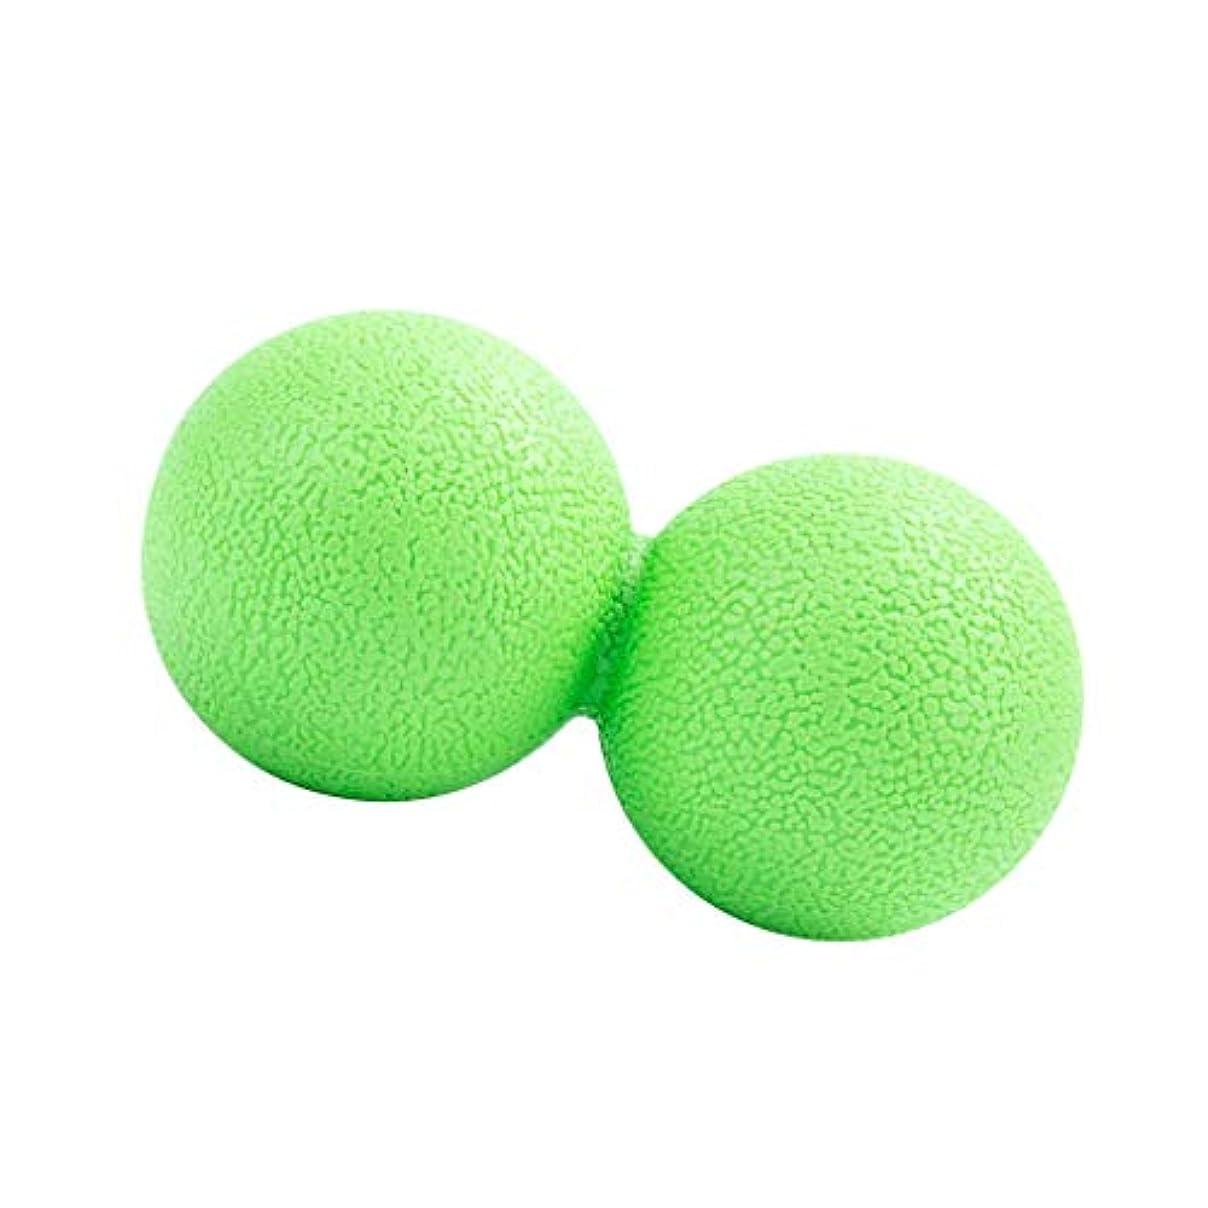 Baoblaze マッサージボール ピーナッツ型 筋リラクサー モビリティボール 健康器具 全2色 - 緑, 13cm